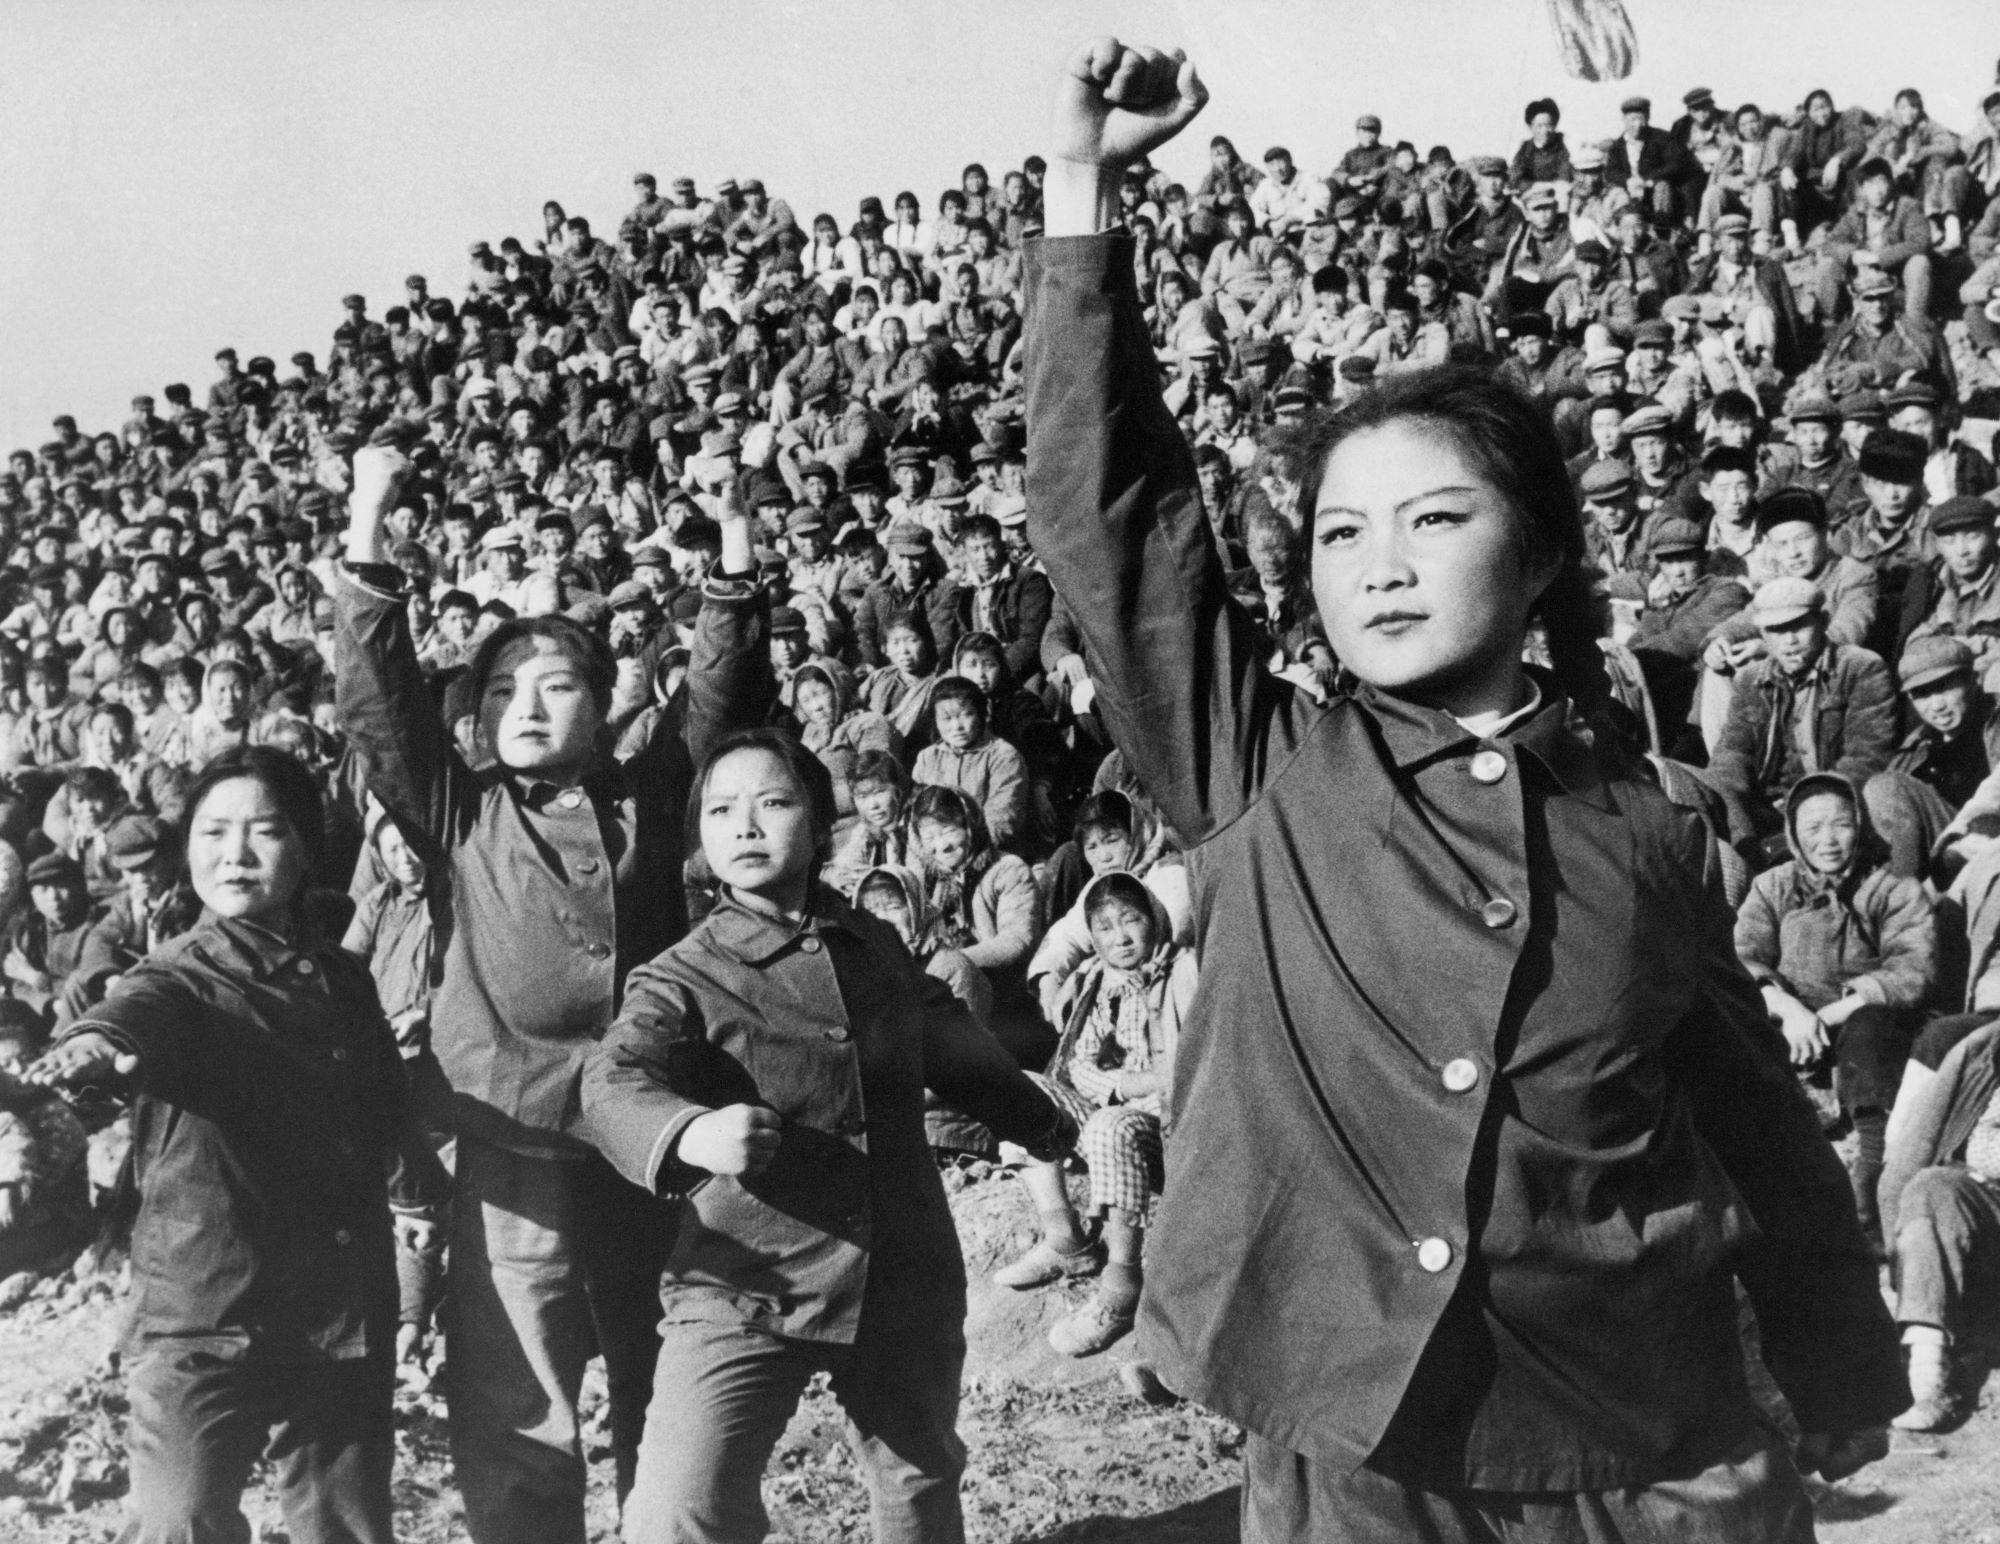 Mao's Revolution (Img Via National Geographic)